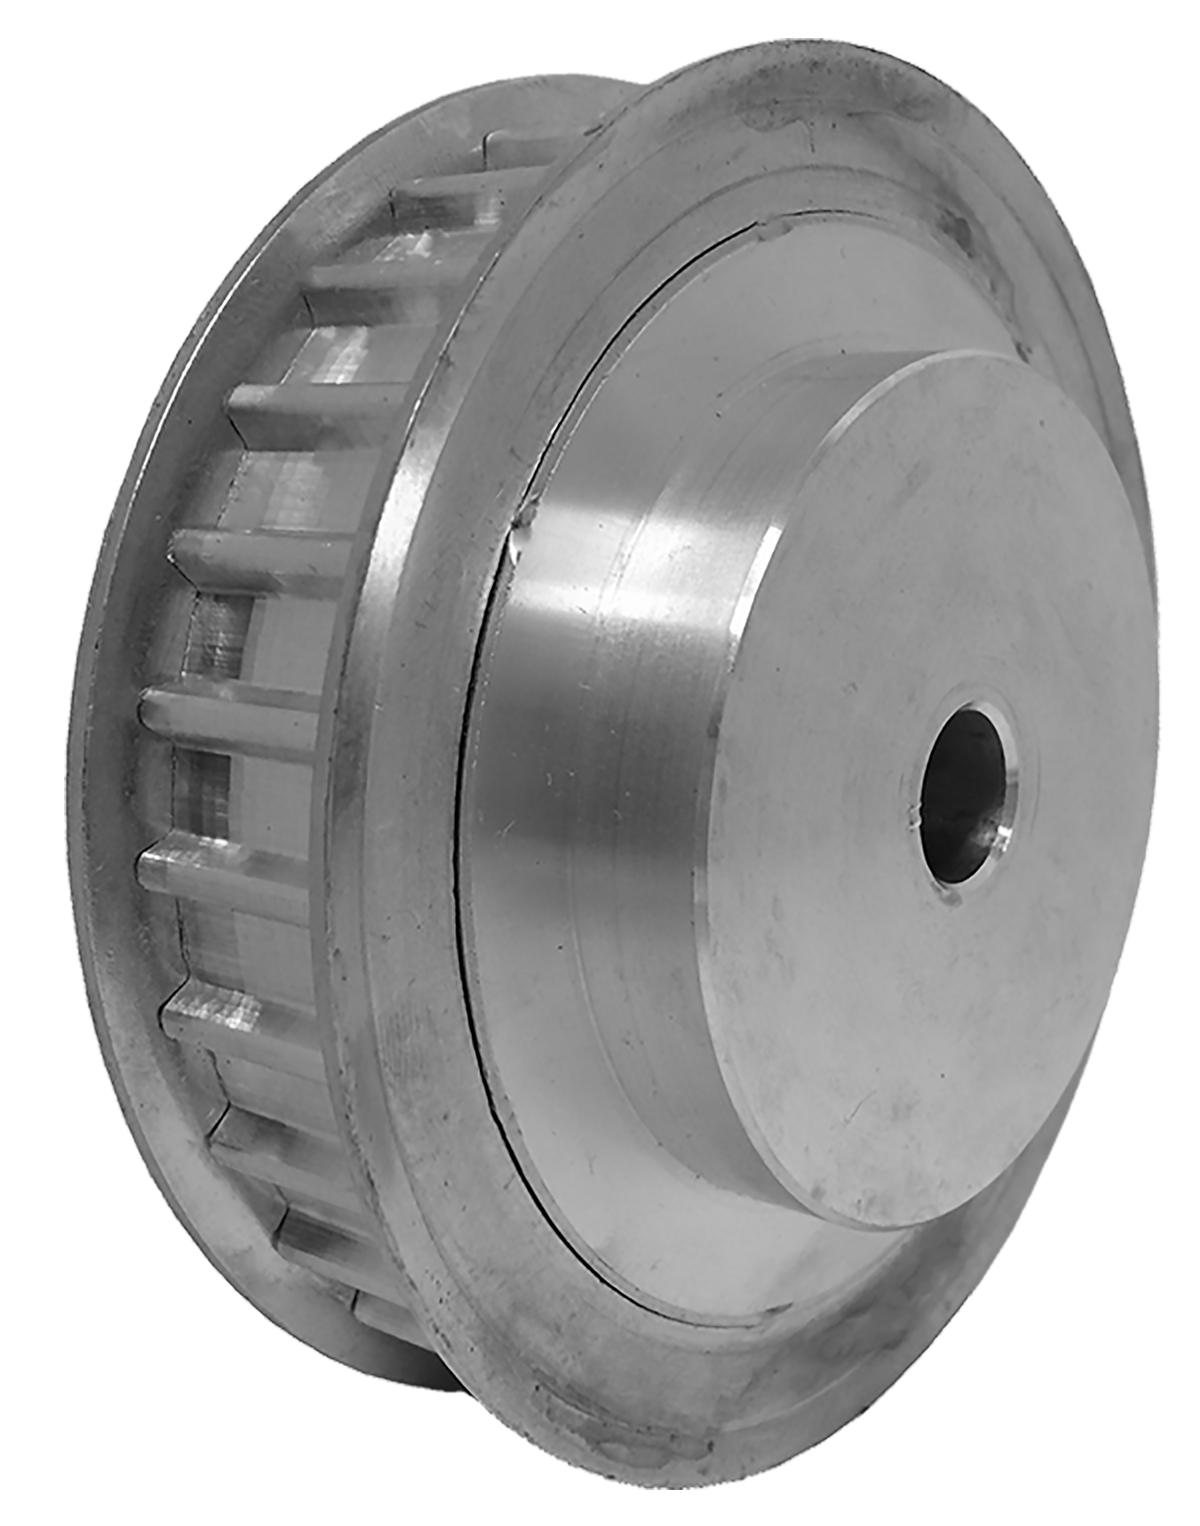 31AT10/30-2 - Aluminum Metric Pulleys